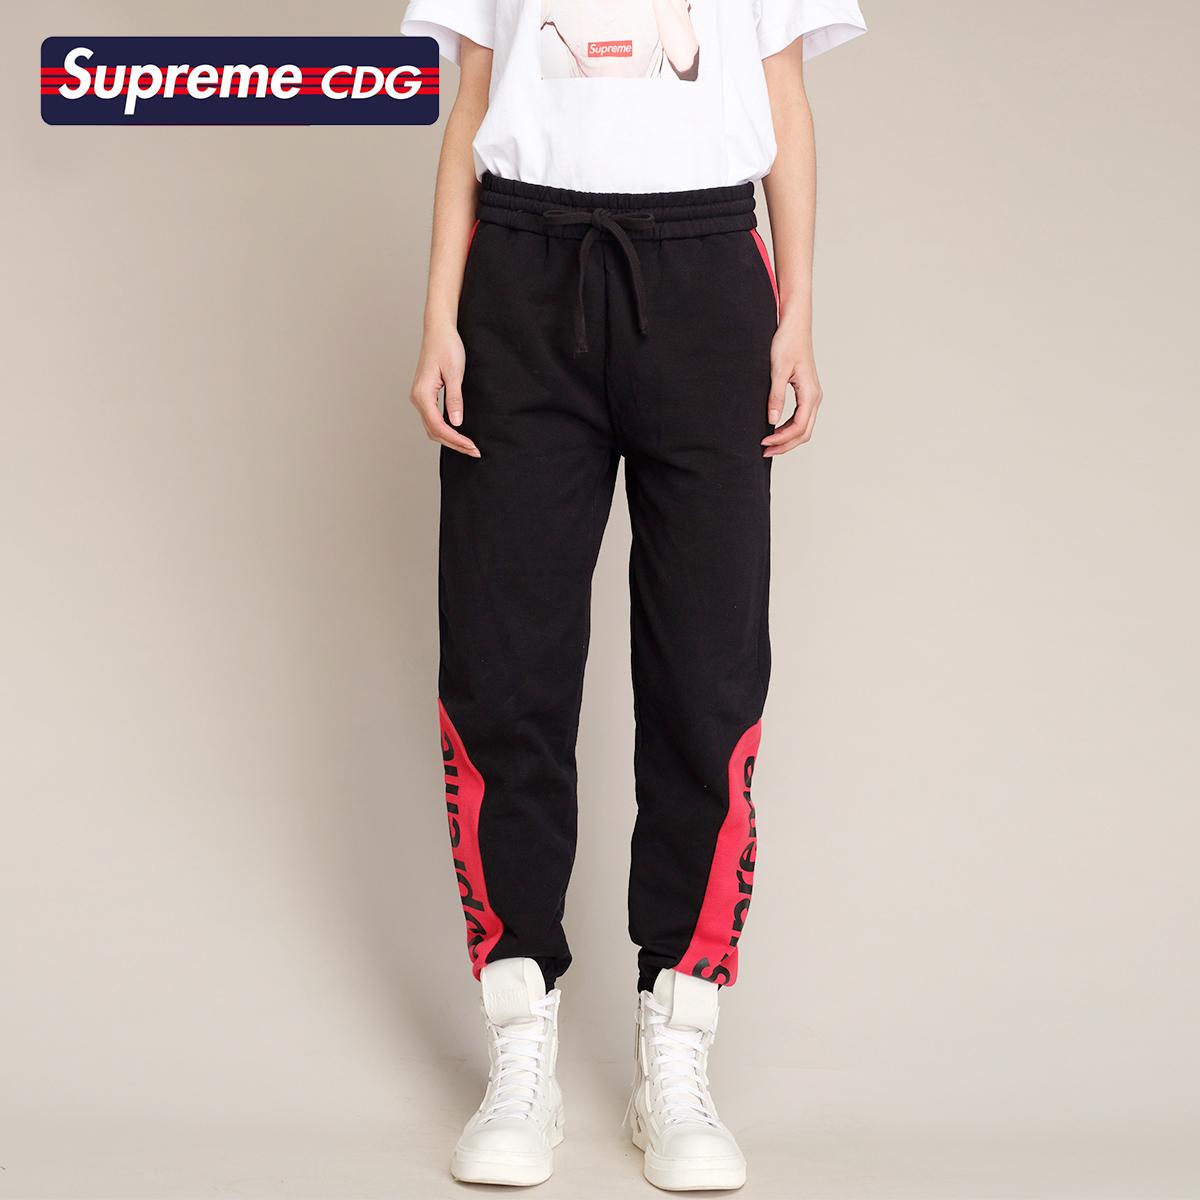 Supreme CDG 2020年春季新款百搭街头休闲卫裤运动裤男女同款裤子